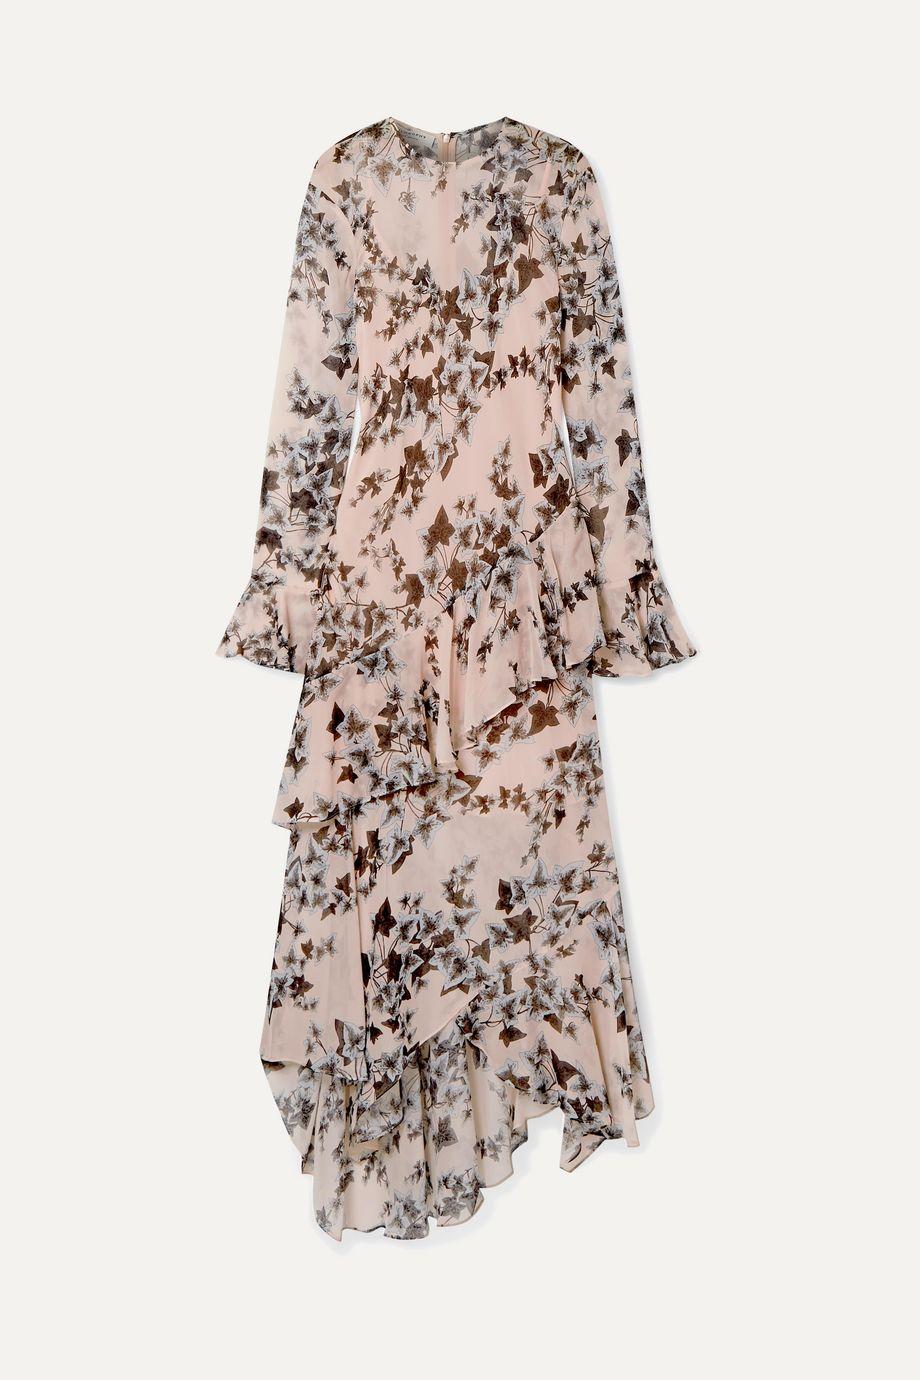 Philosophy di Lorenzo Serafini Ruffled floral-print crepe de chine midi dress